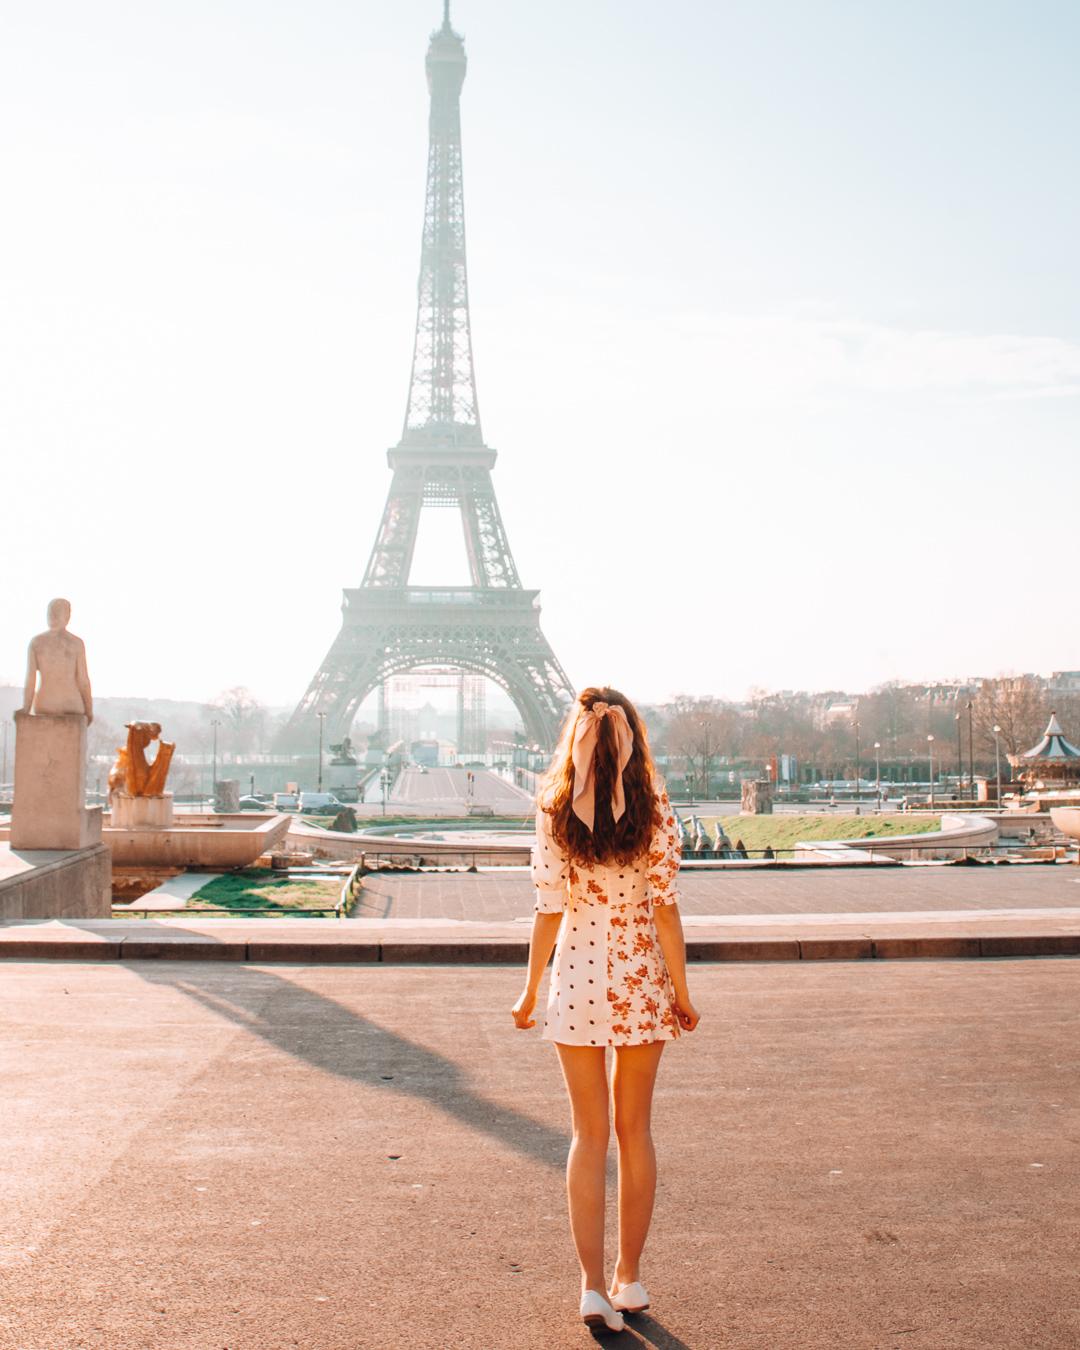 The Eiffel Tower from Trocadéro